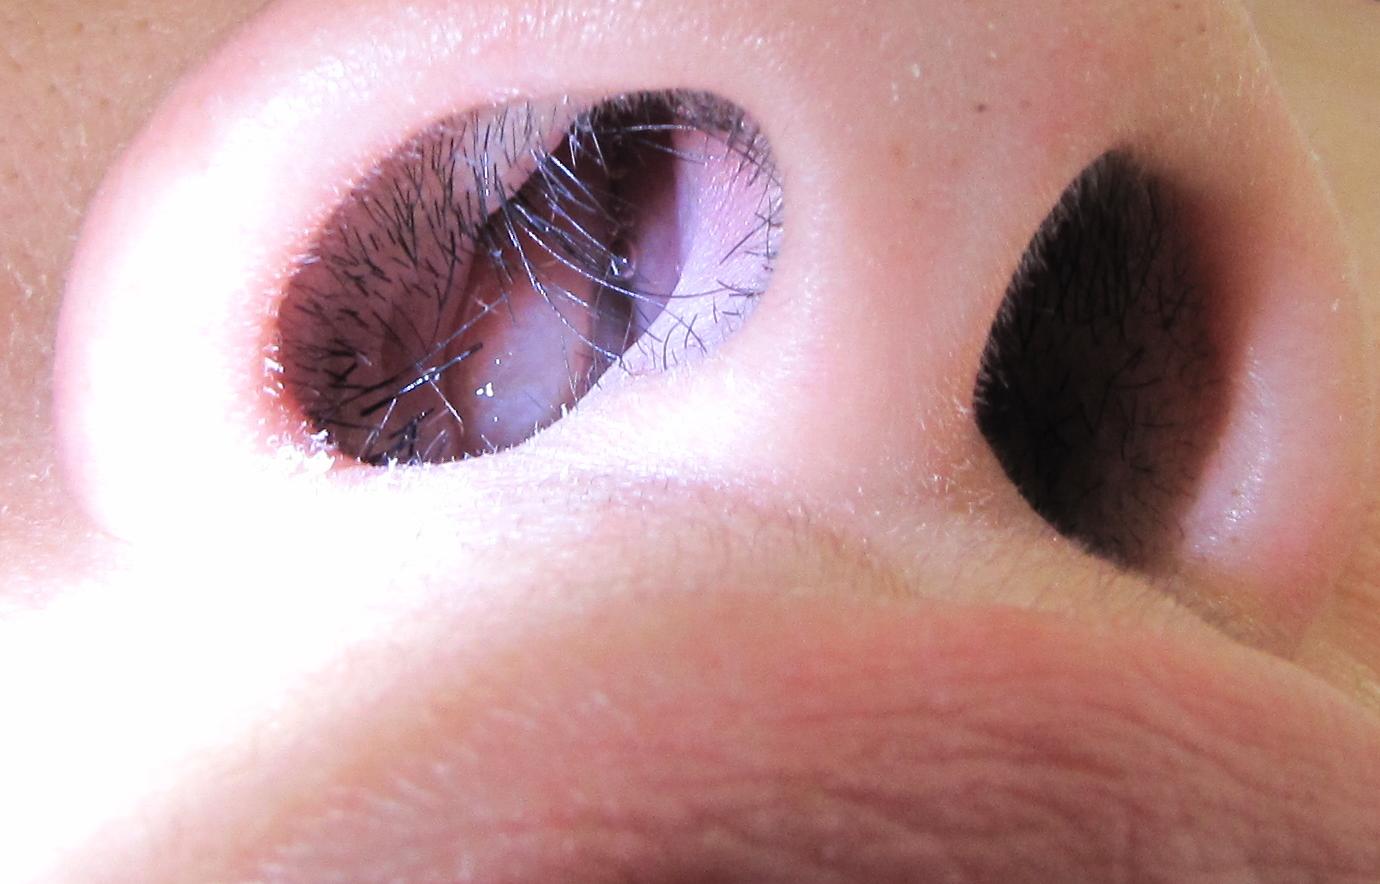 papilloma nose icd 10 cancer de piele la fata